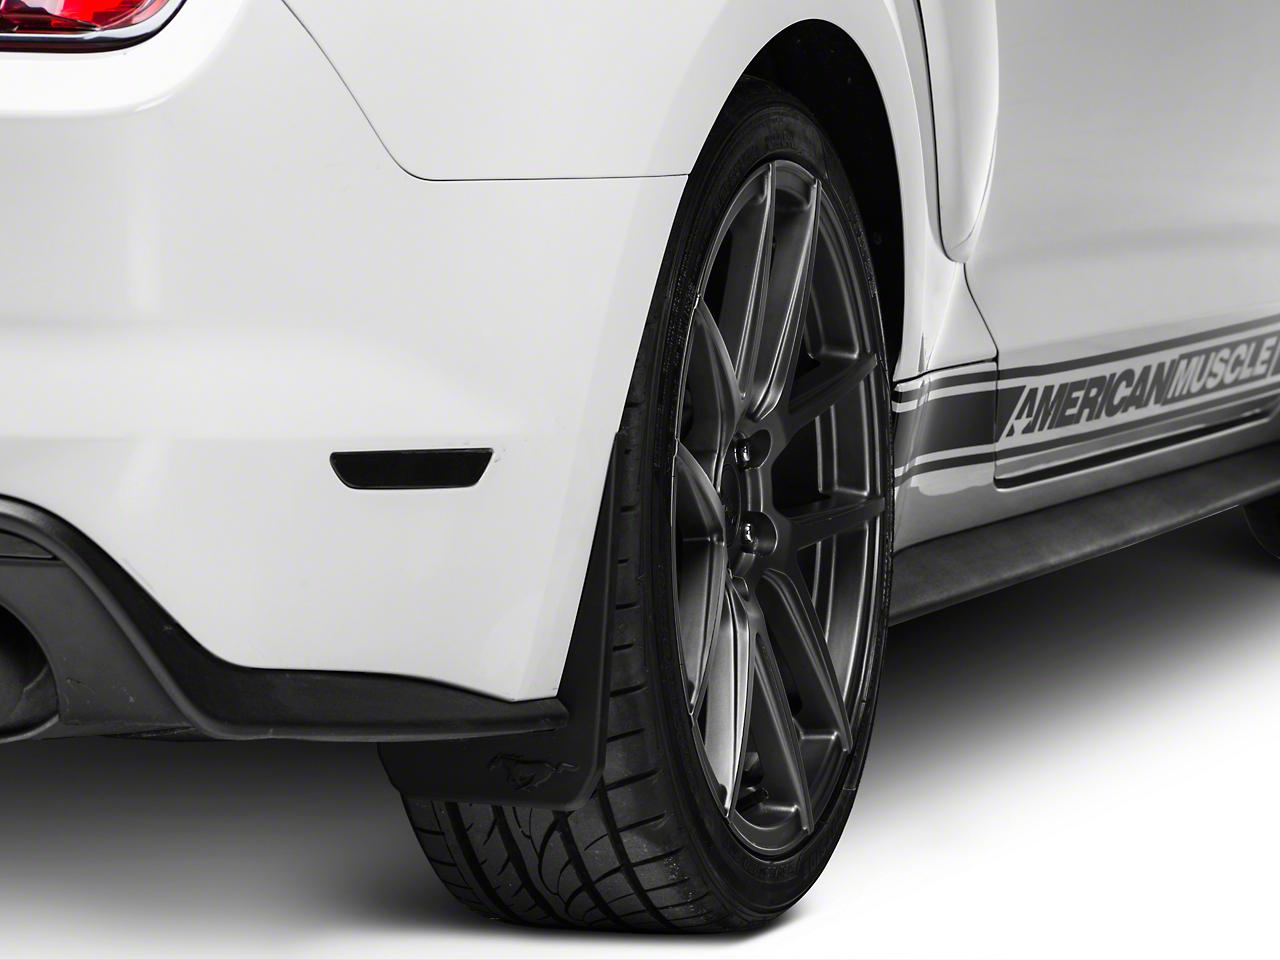 MMD Splash Guards w/ Pony Logo - Rear Pair (15-17 GT Premium, EcoBoost Premium)